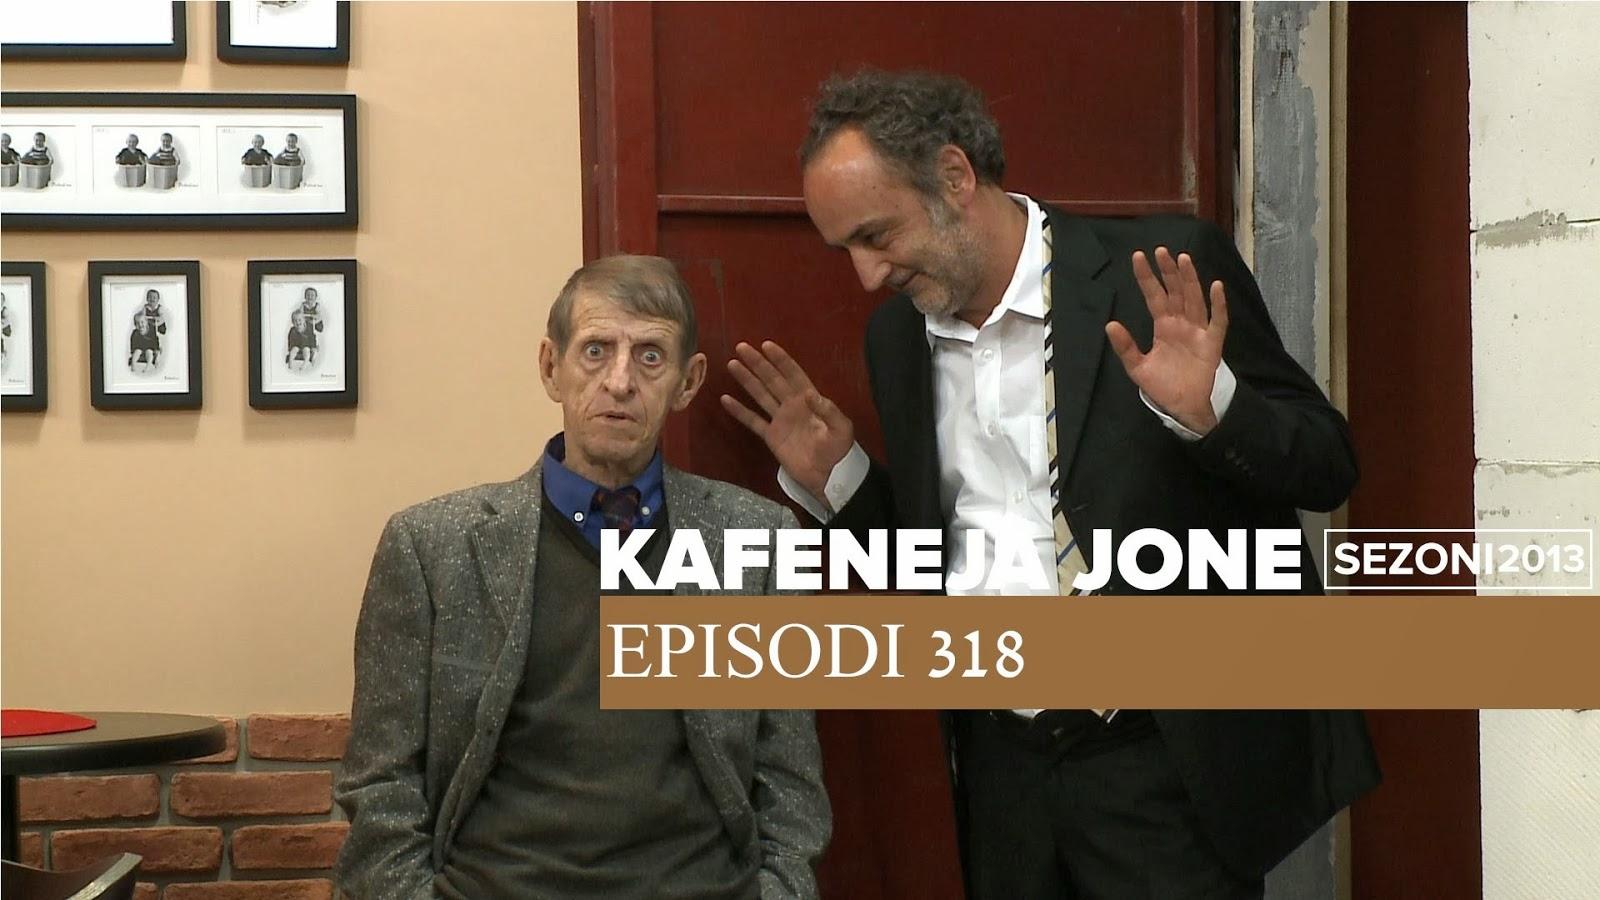 kafeneja jone http://kafenejajonecmb.blogspot.com/